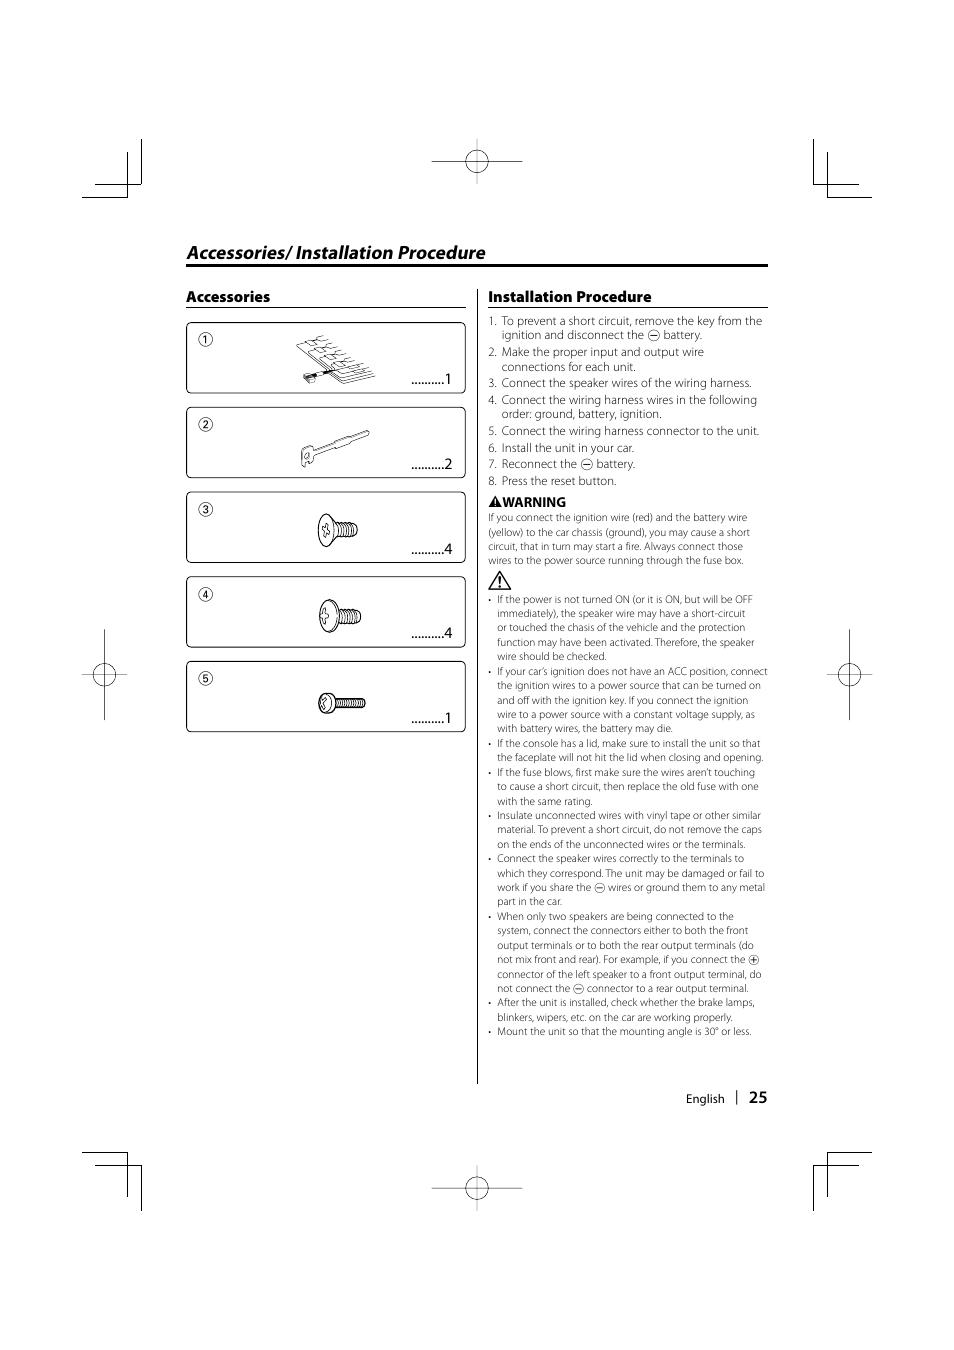 Wiring Diagram Kenwood Kdc Mp205 Electrical Diagrams Model 2025 Accessories Installation Procedure User Manual